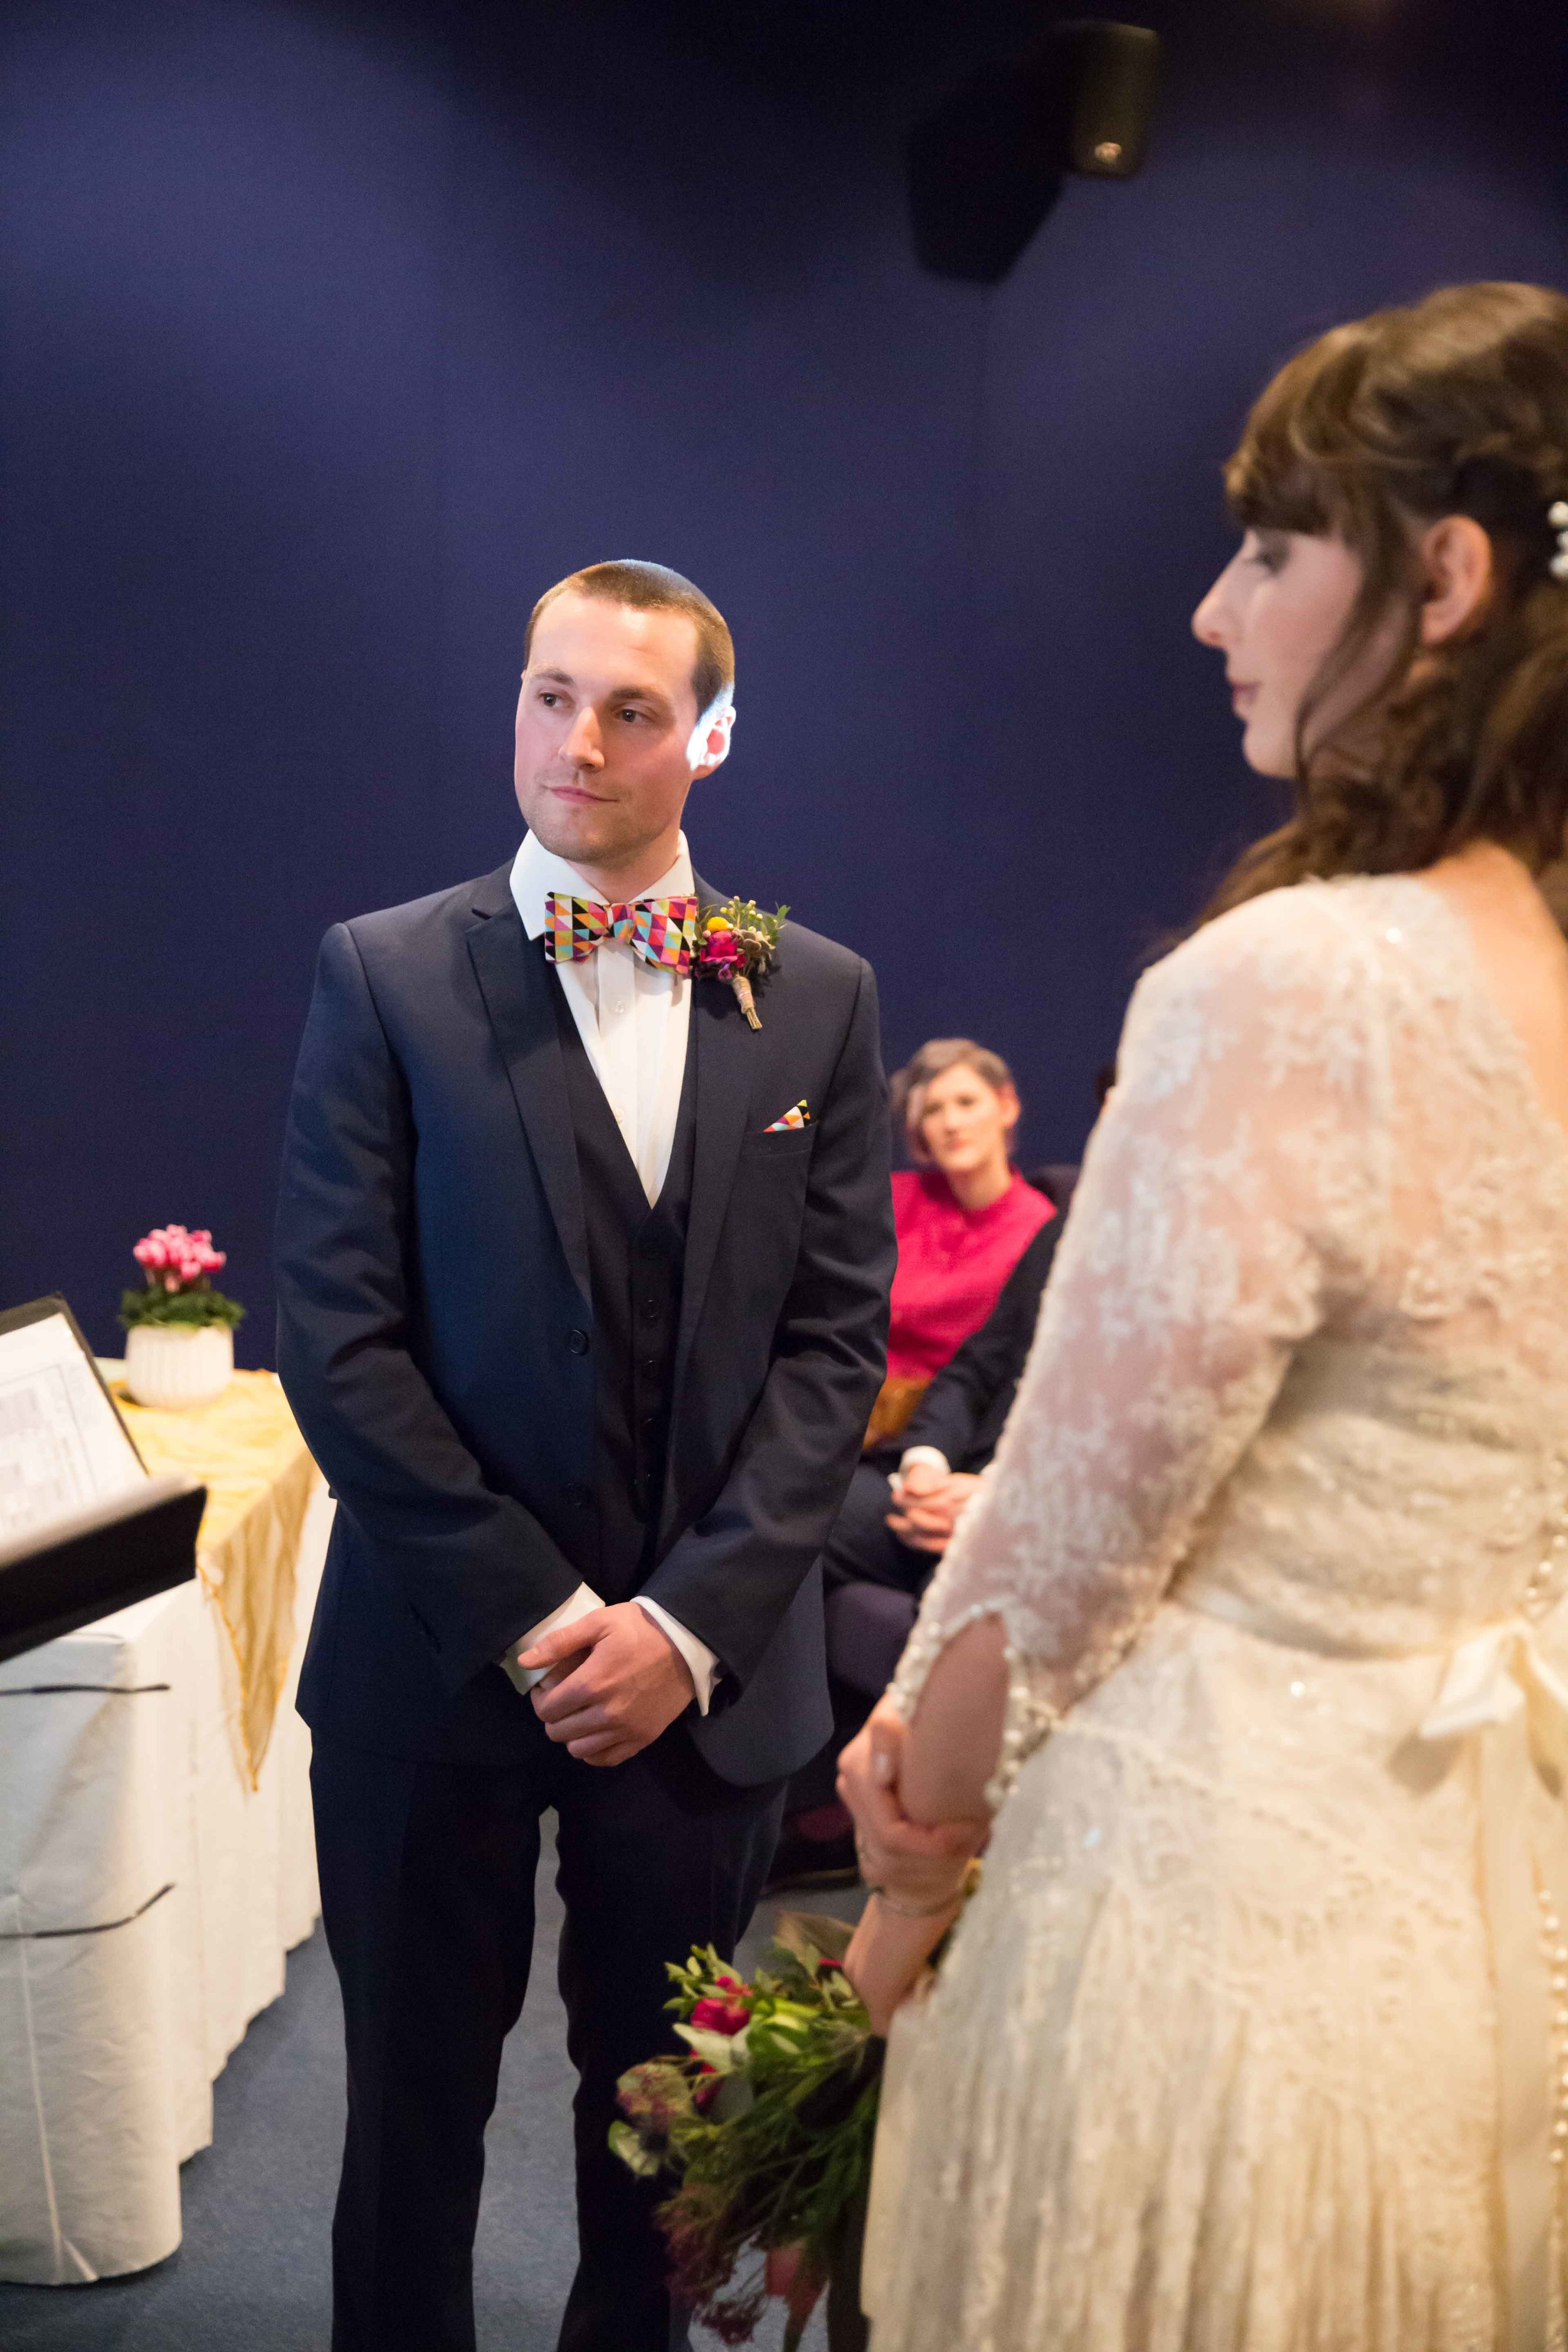 Adam & Faye - Wright Wedding Photography - Bristol Wedding Photographer -99.jpg